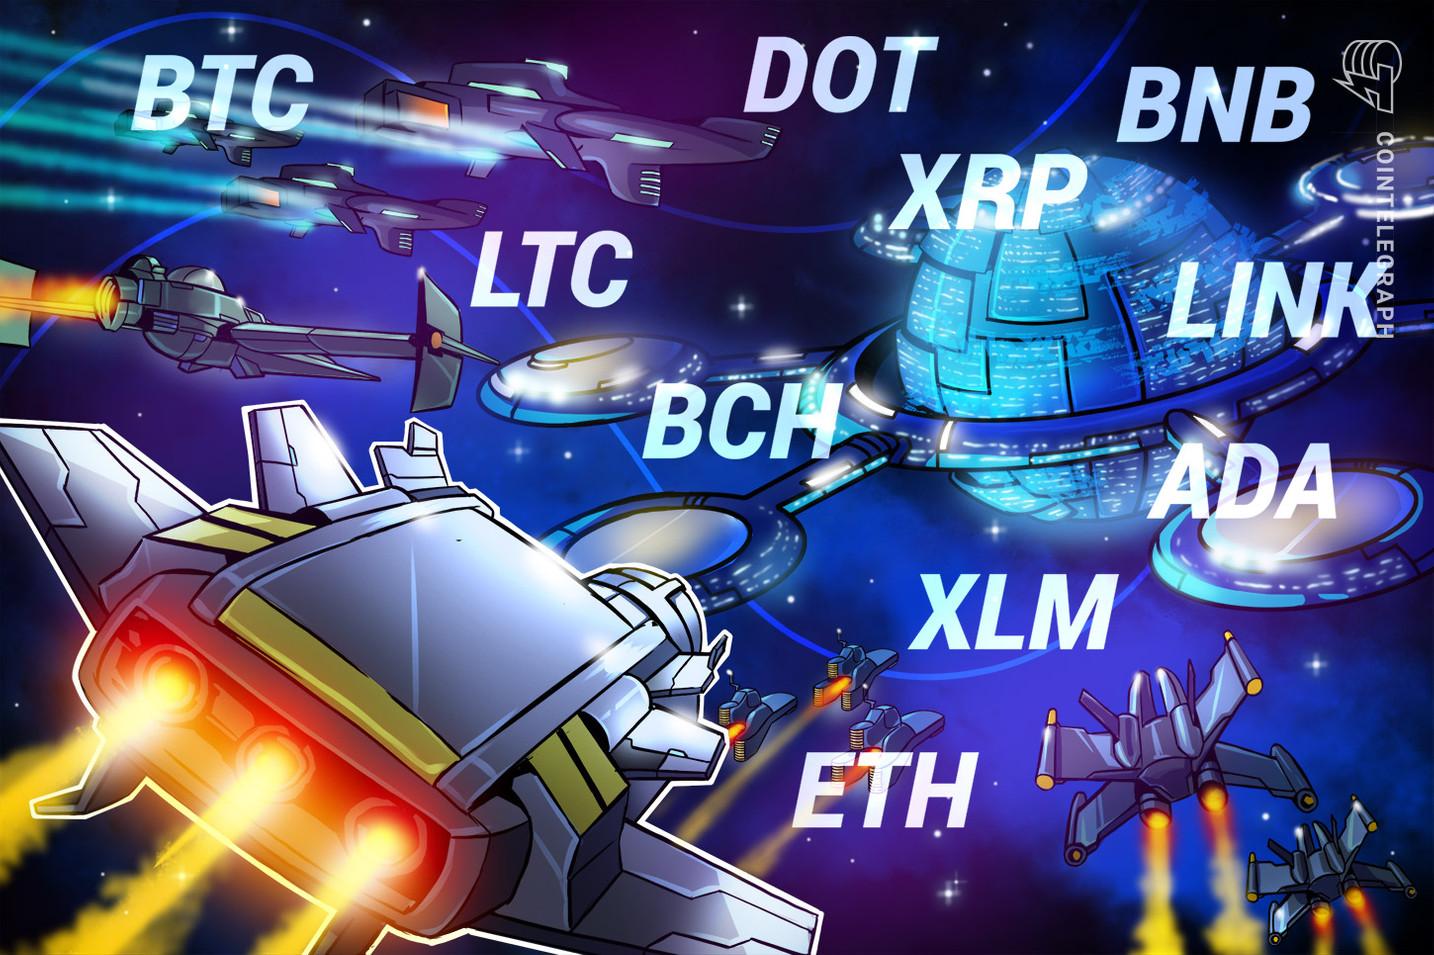 Análisis de precios del 27 de enero: BTC, ETH, DOT, XRP, ADA, LINK, LTC, BCH, BNB, XLM